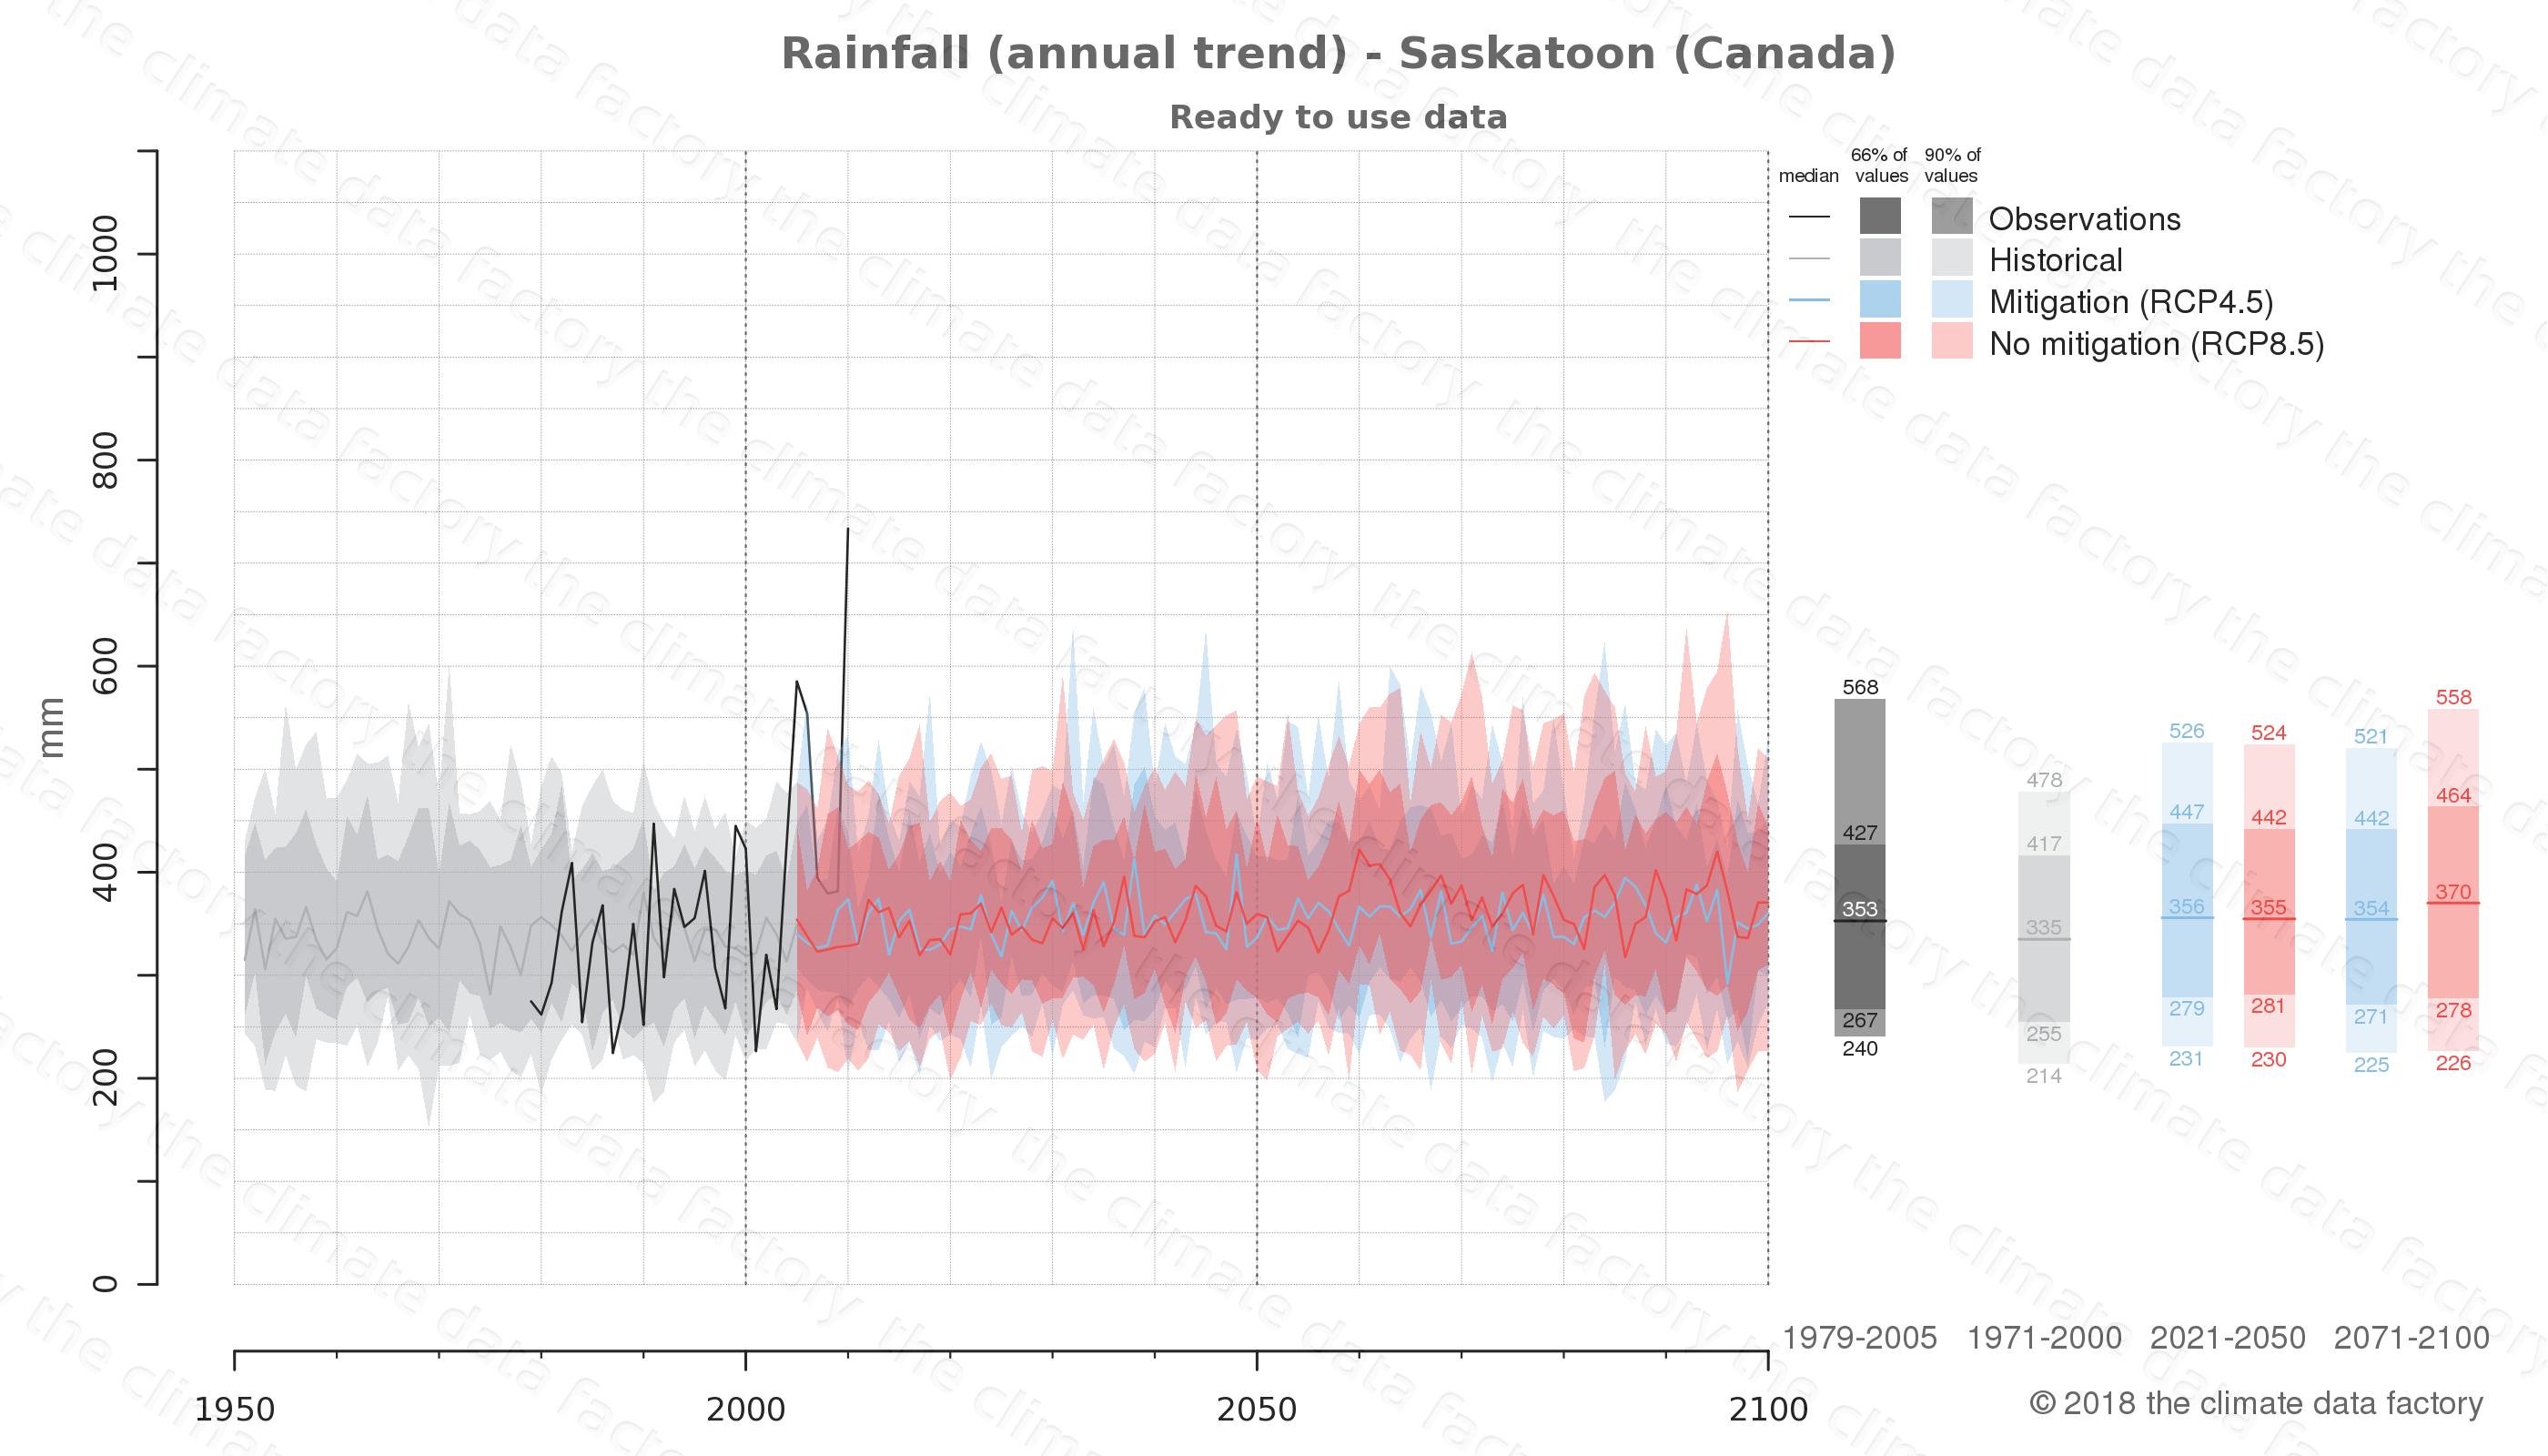 climate change data policy adaptation climate graph city data rainfall saskatoon canada